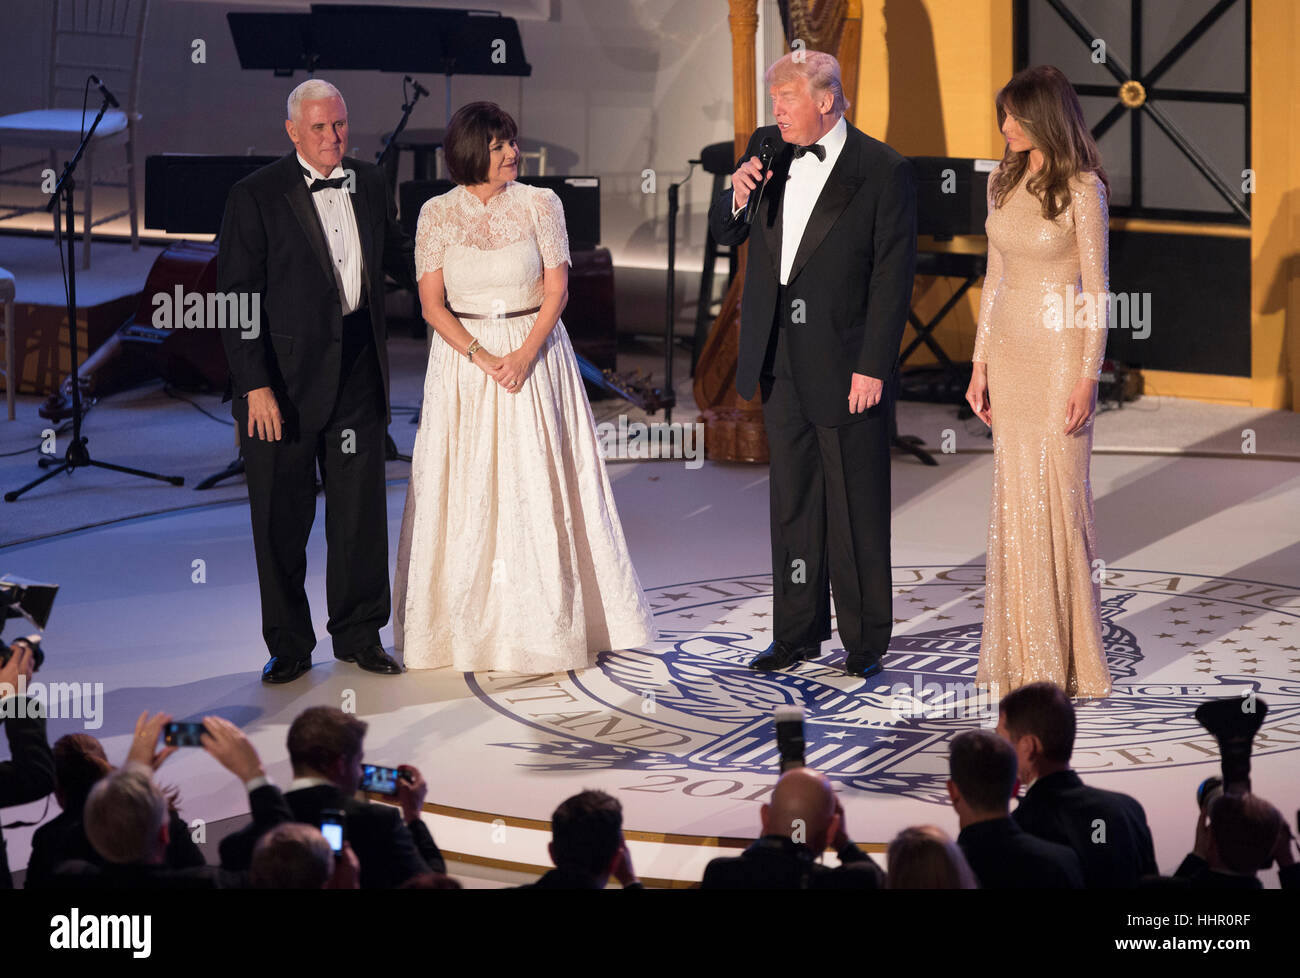 Washington, DC, USA. 19. Januar 2017. Vice President-Elect The United States Mike Pence, seine Frau Karen Pence Stockfoto